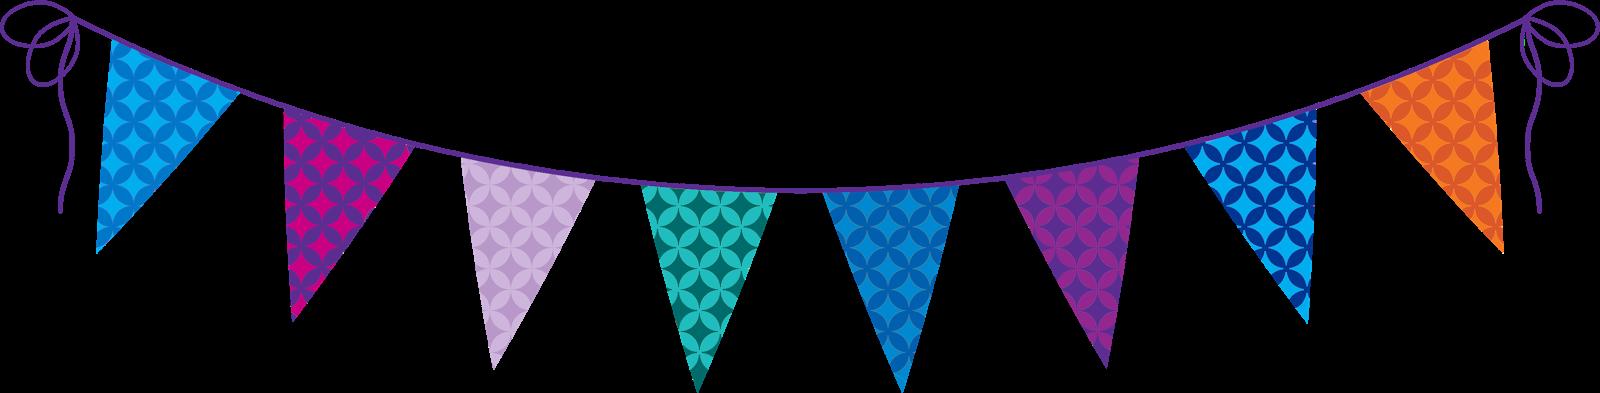 Birthday Flag PNG - 158111